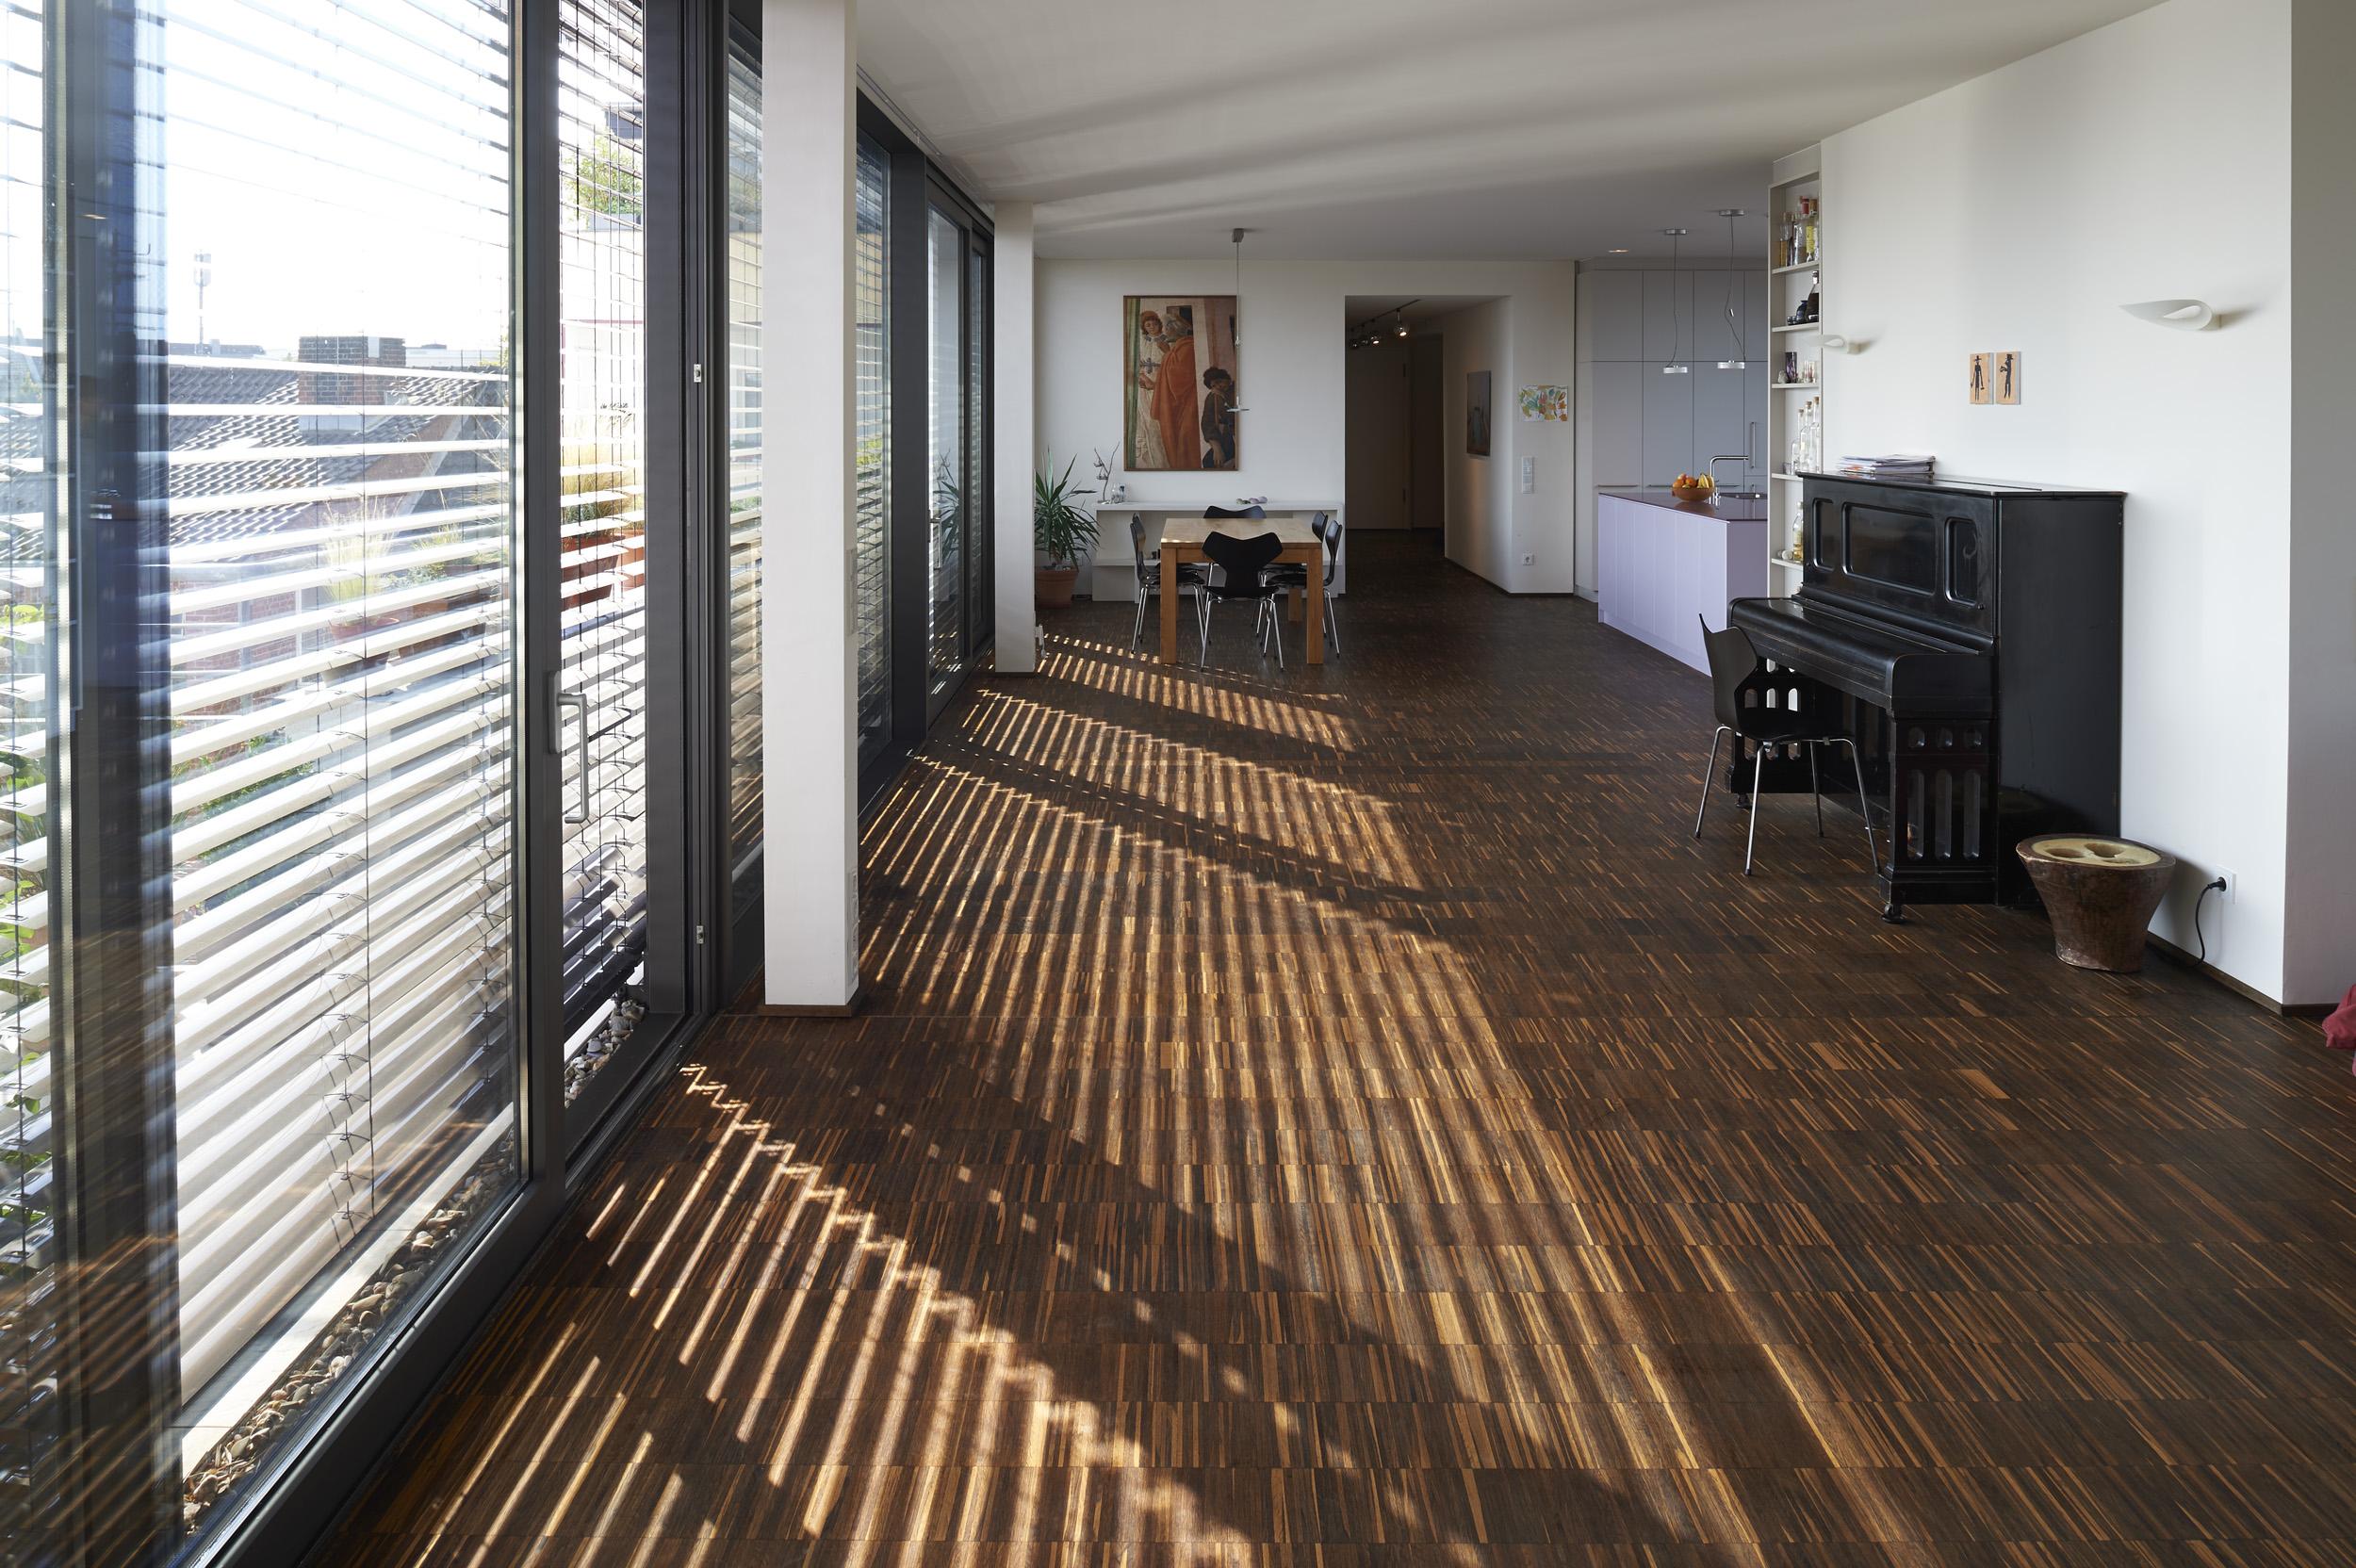 Architektur Borchmann Penthouse Im Hinterhof